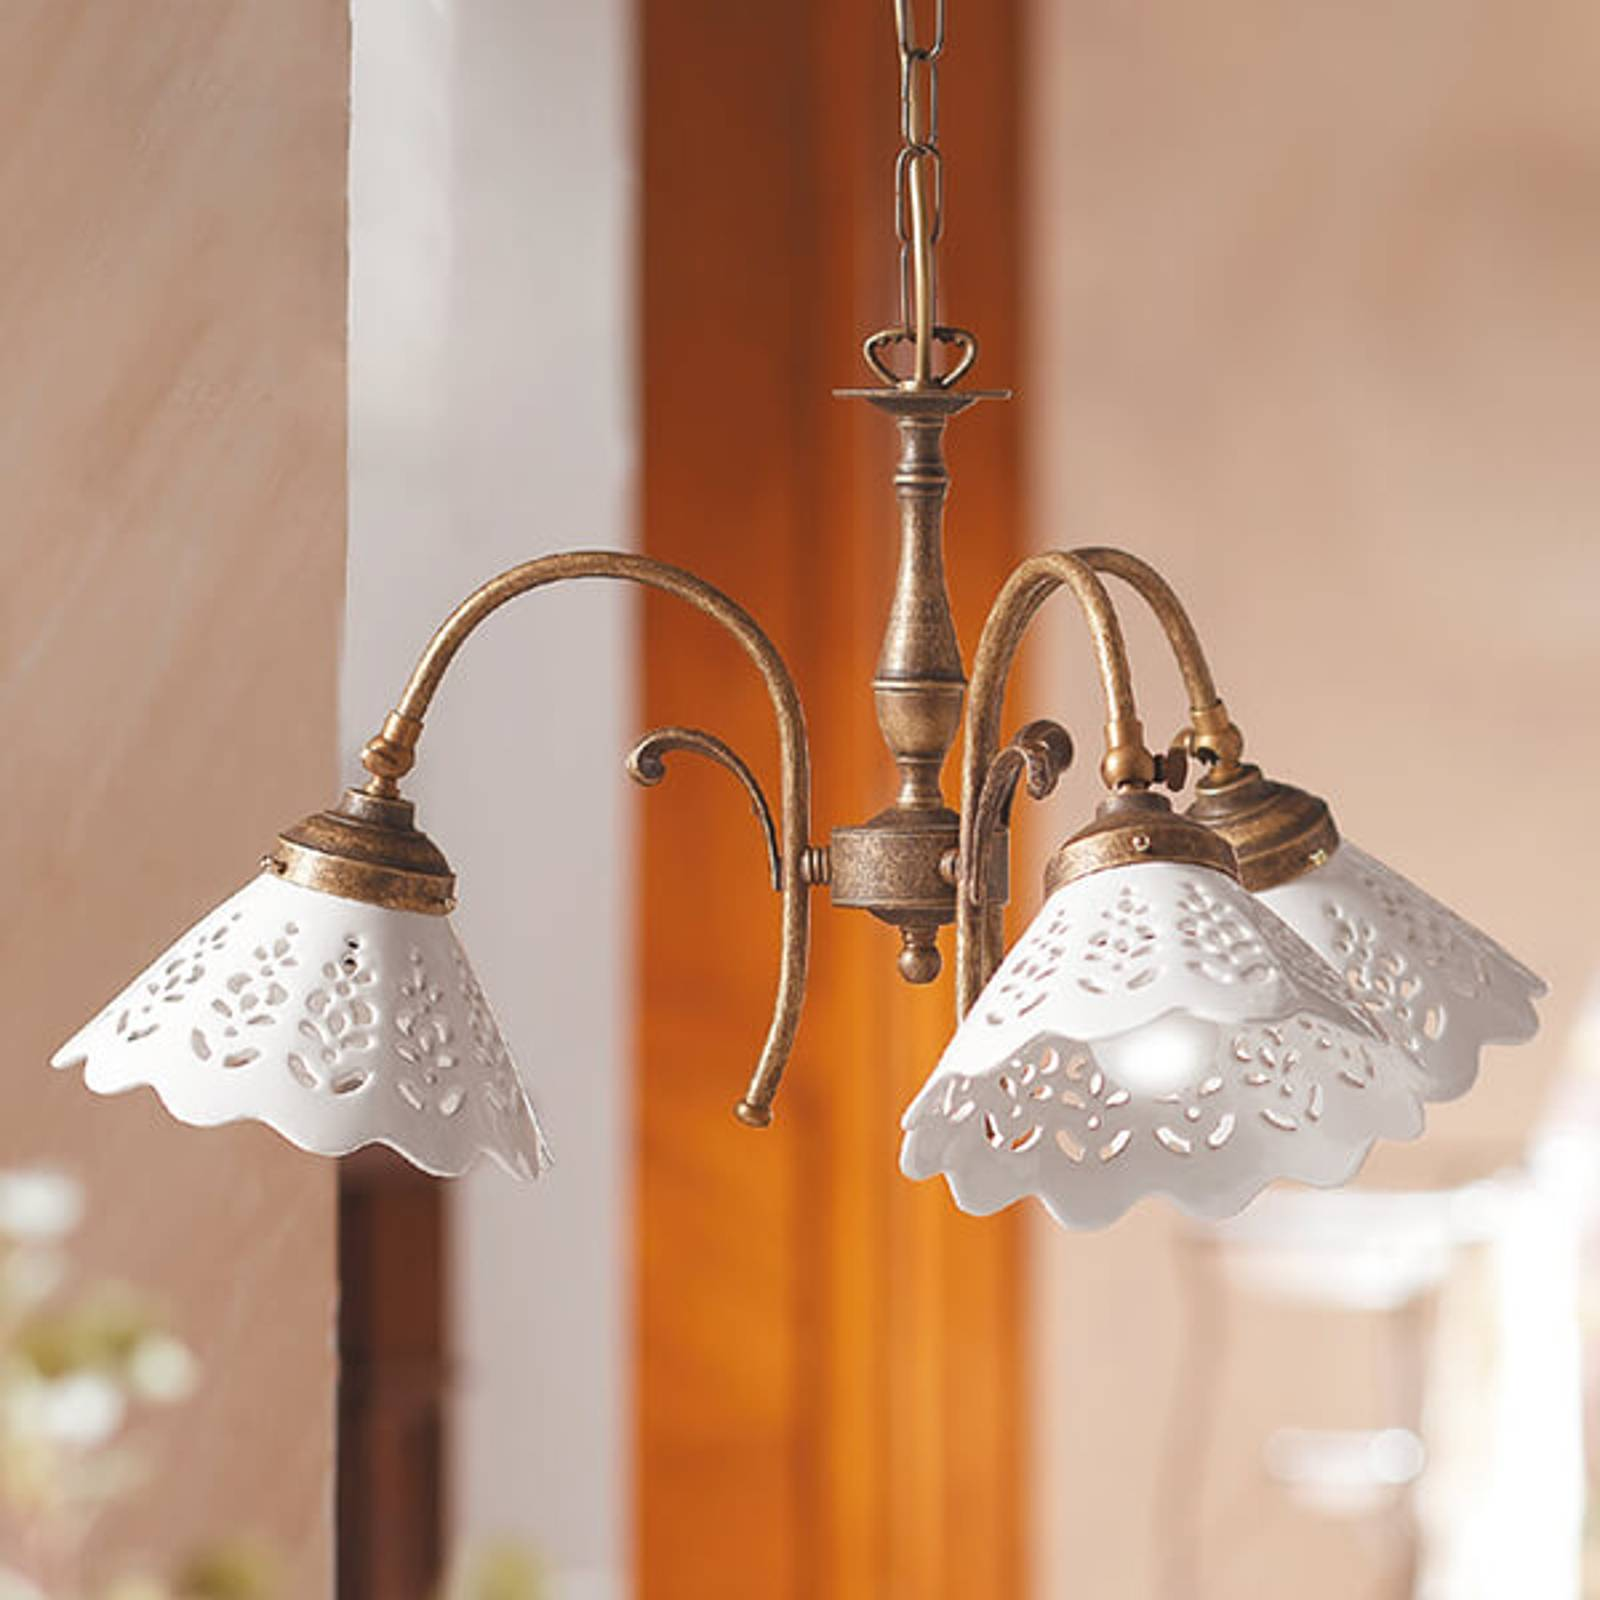 Hanglamp Semino m keramiek lampenkap, m 3 lampjes